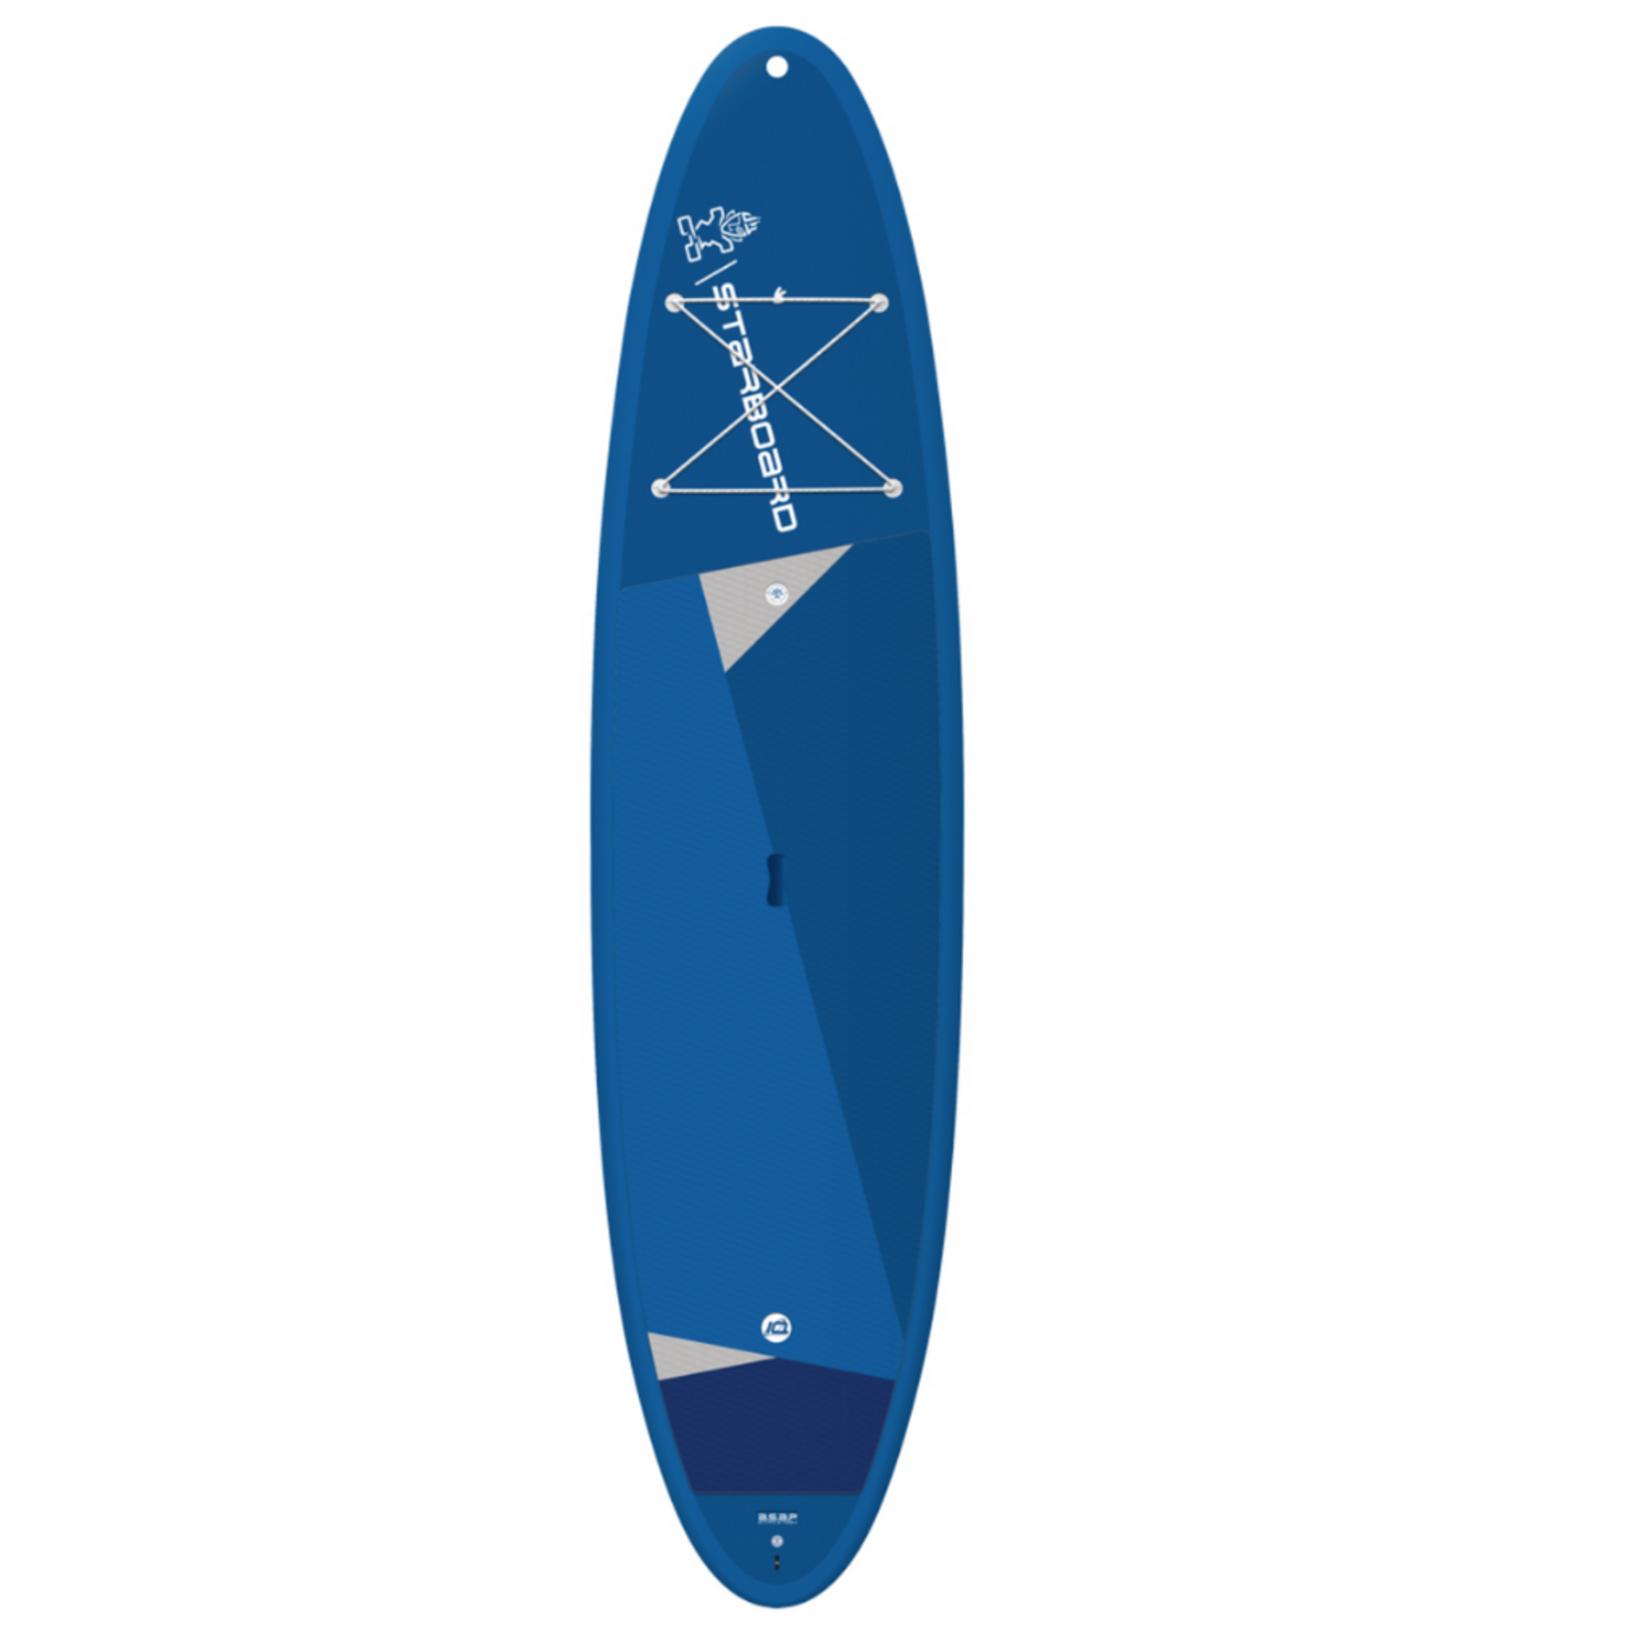 Starboard Prebook Starboard GO ASAP 10'8 x 31